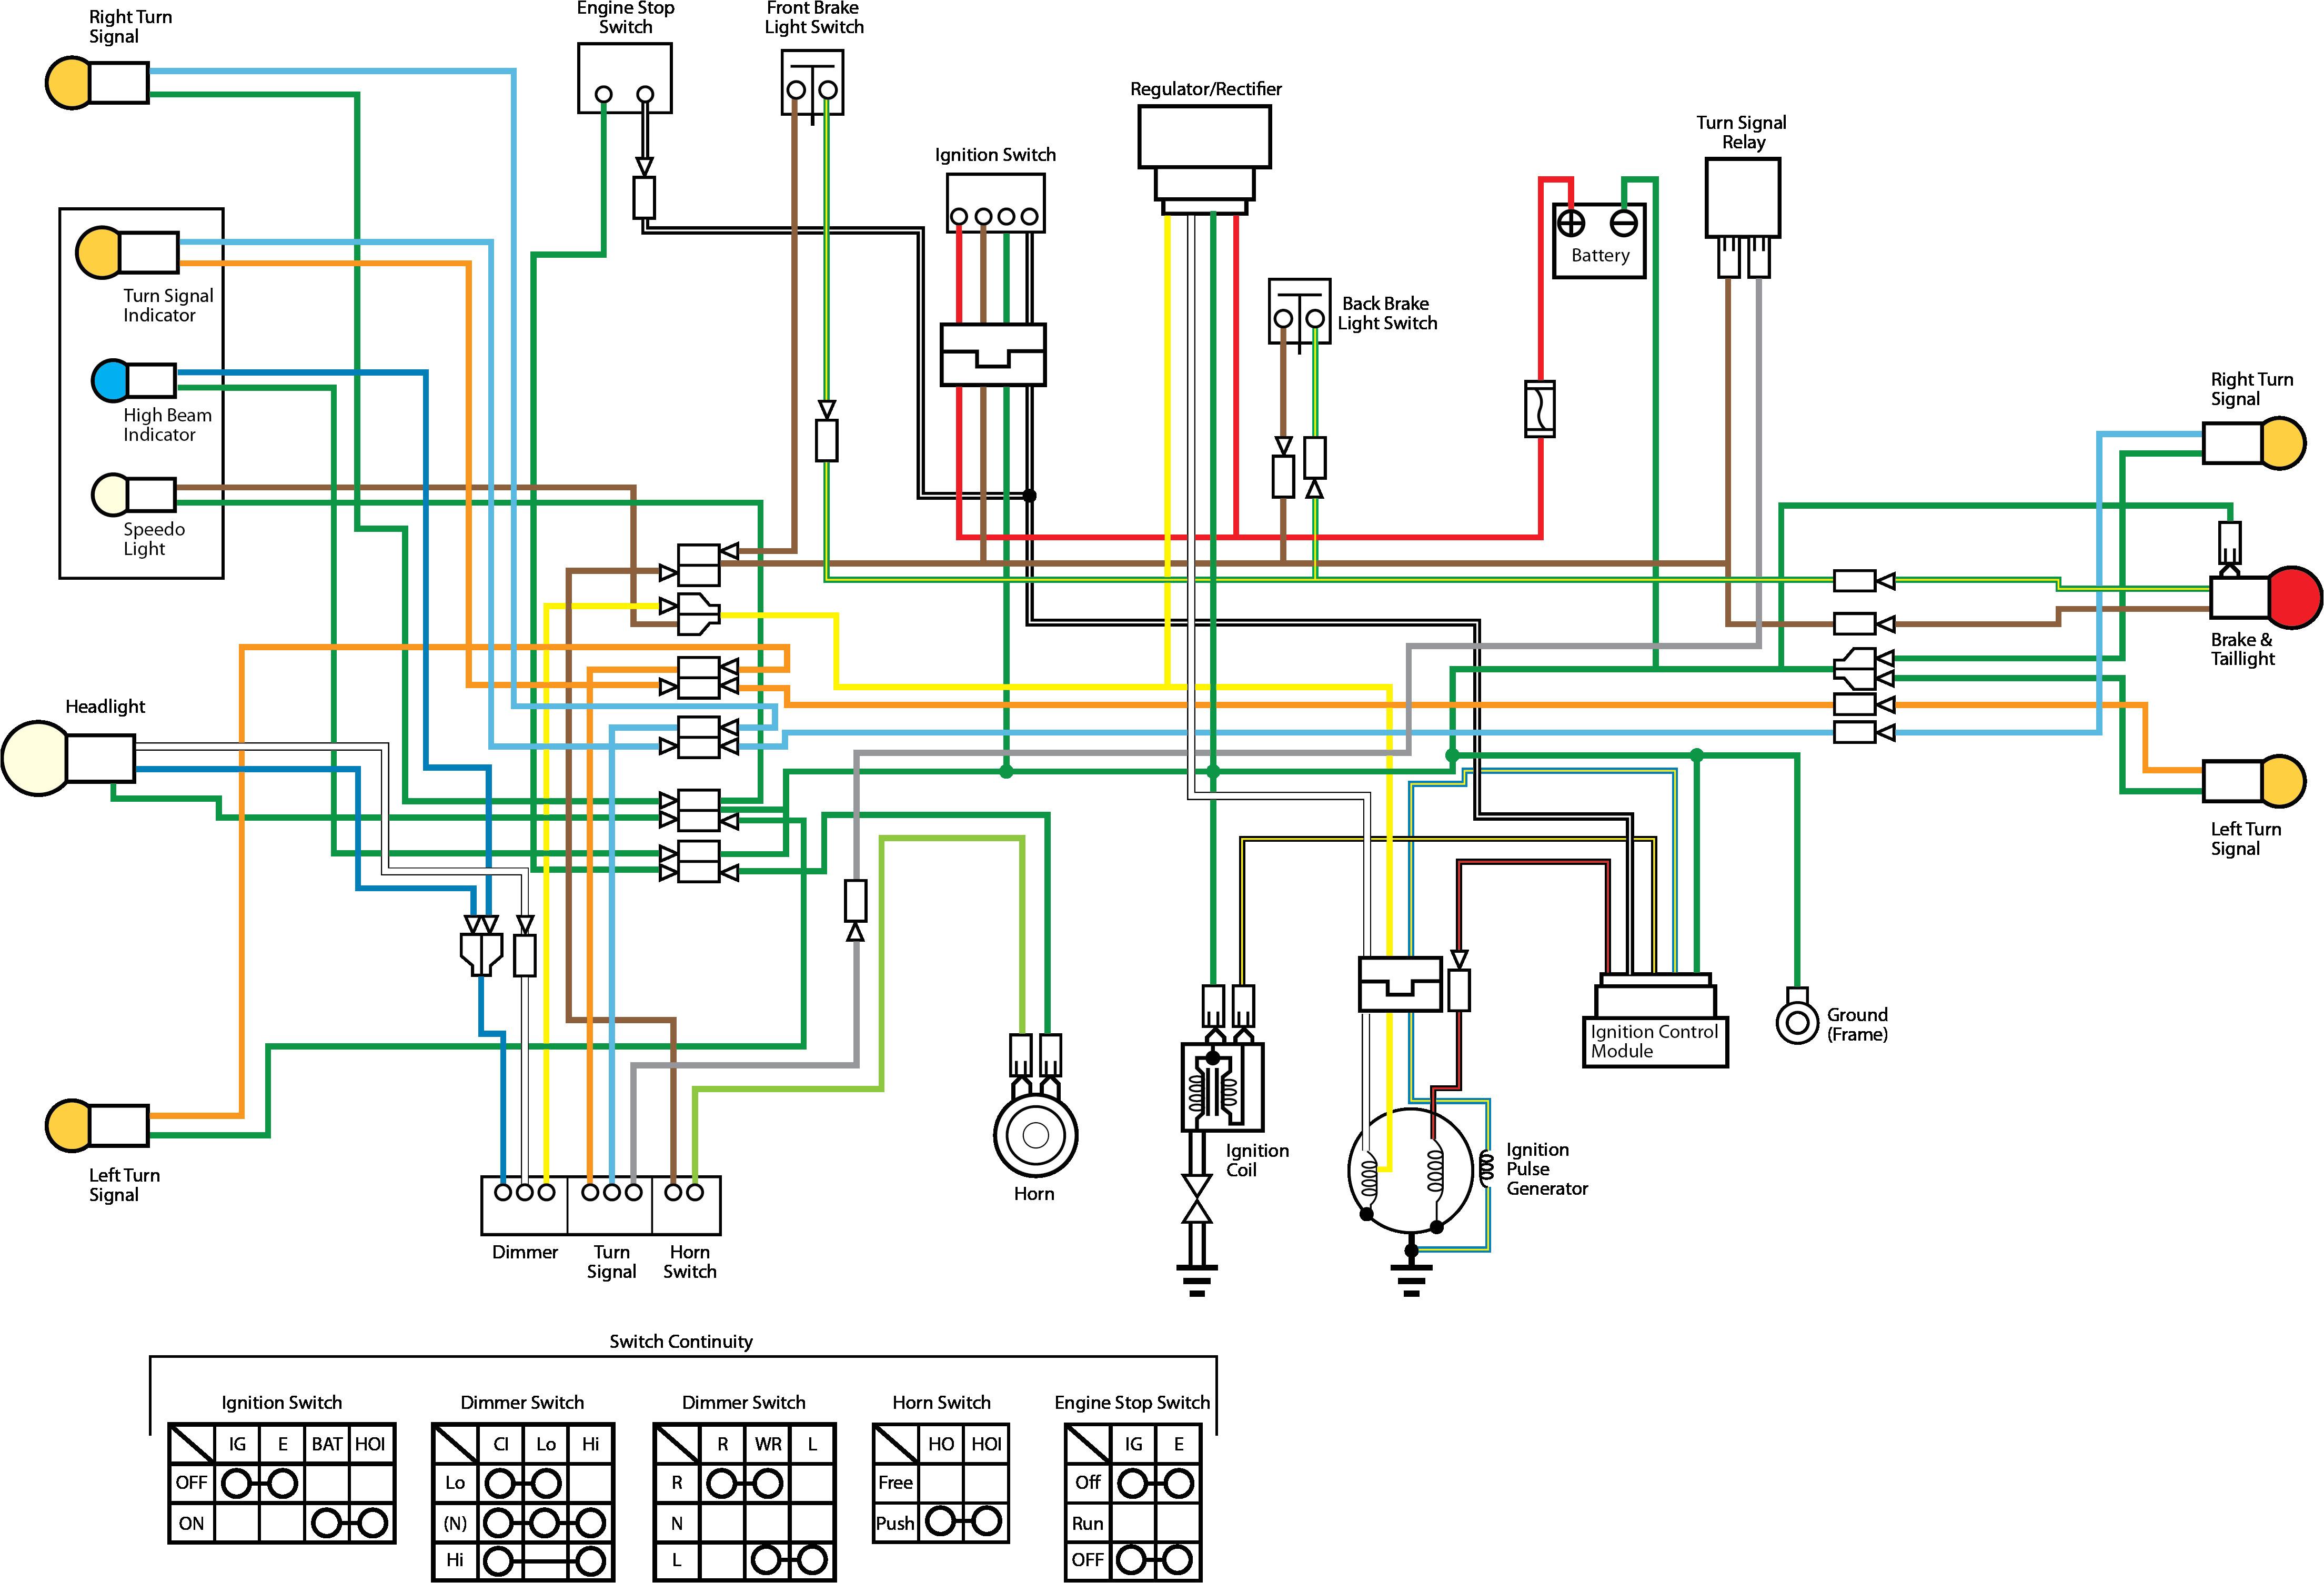 honda 125 wiring diagram wiring diagram expert honda wave 125 wiring diagram honda 125 wiring diagram